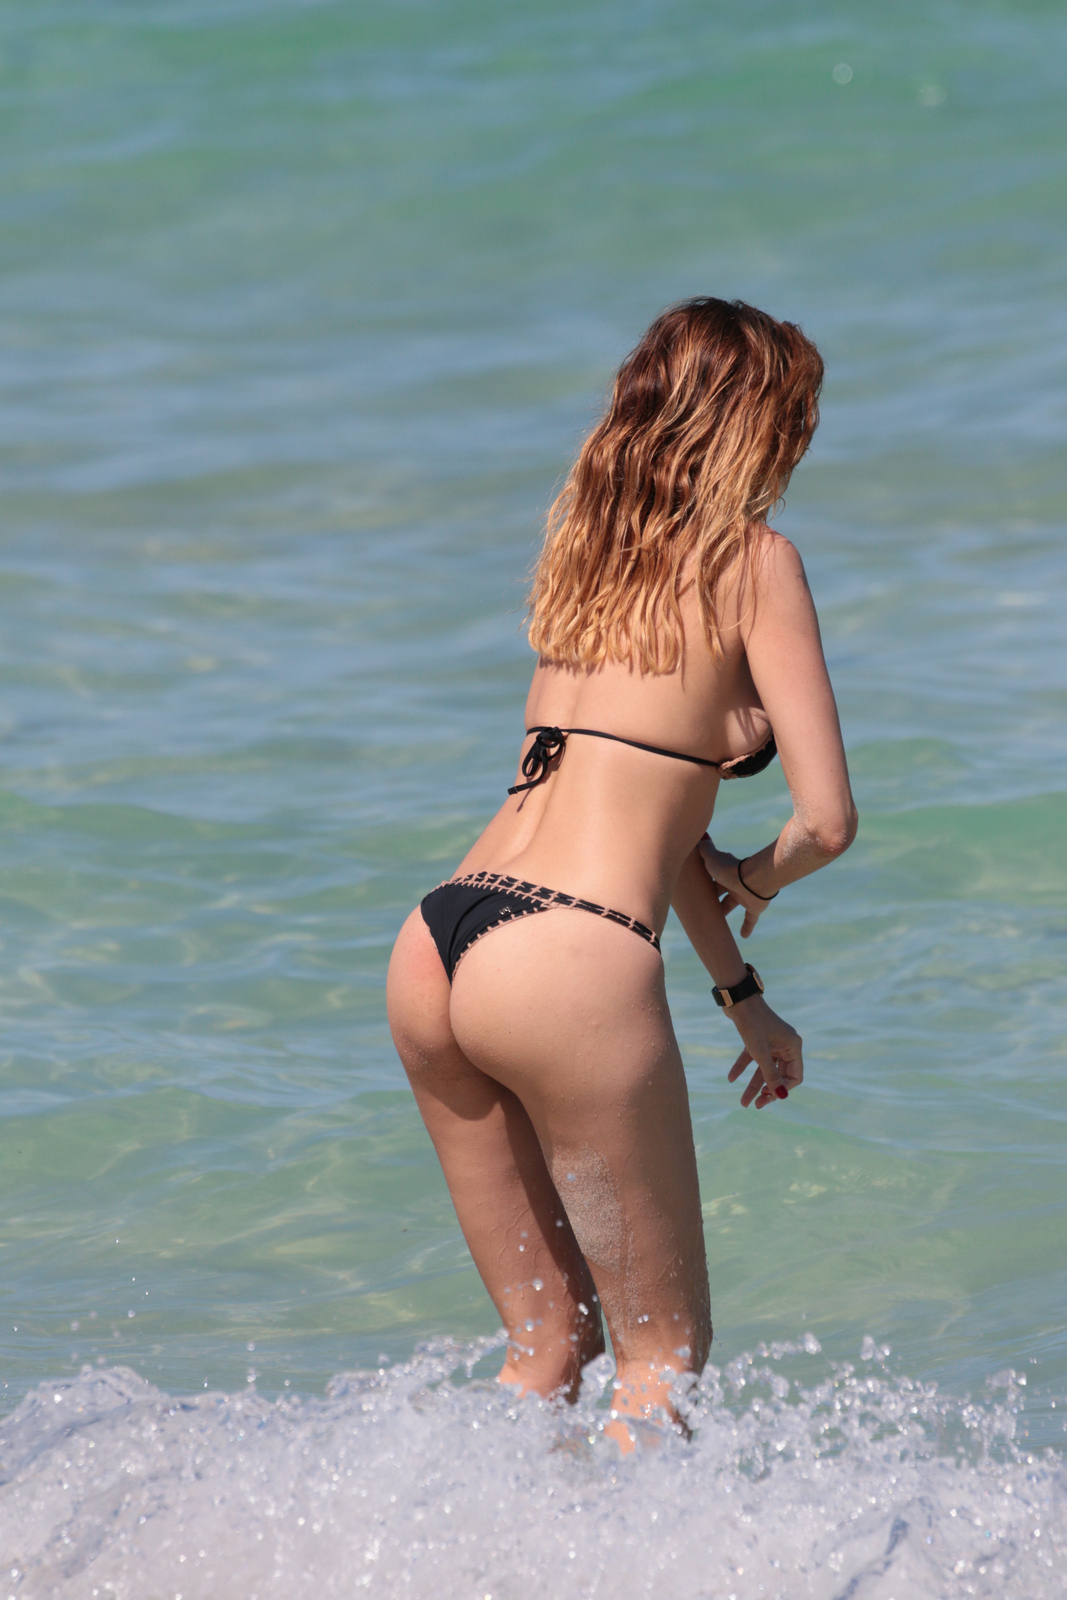 Aida Yespica - In a bikini (Miami)